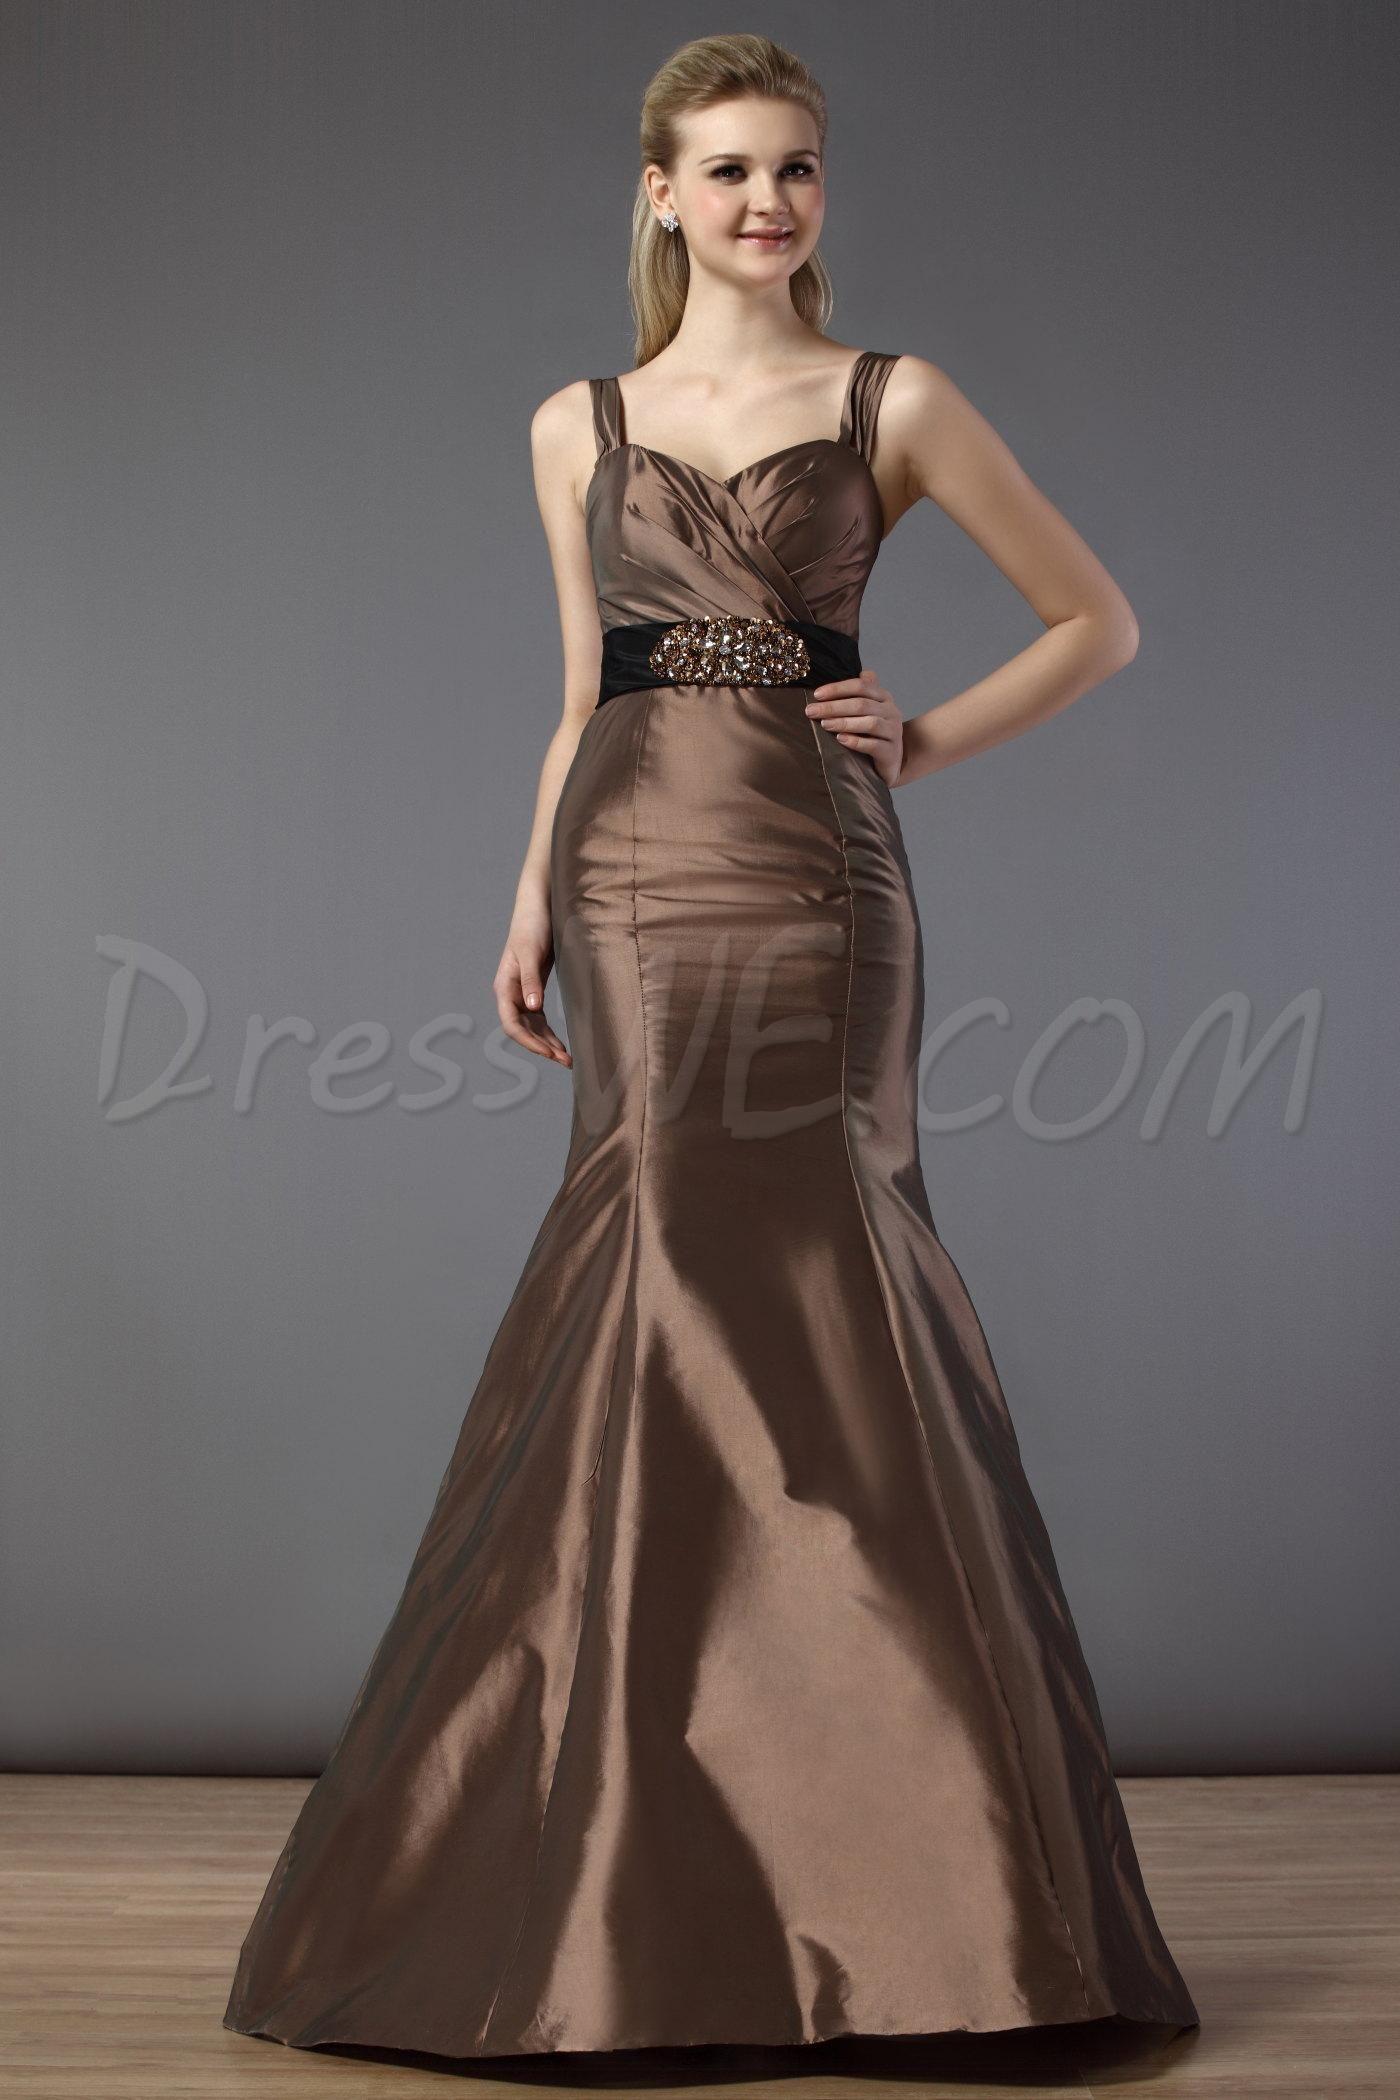 Fabulous Ruched Sashes/Ribbons Trumpet Spaghetti Straps Bridesmaid Dress 10521501 - 2013 Bridesmaid Dresses - Dresswe.Com